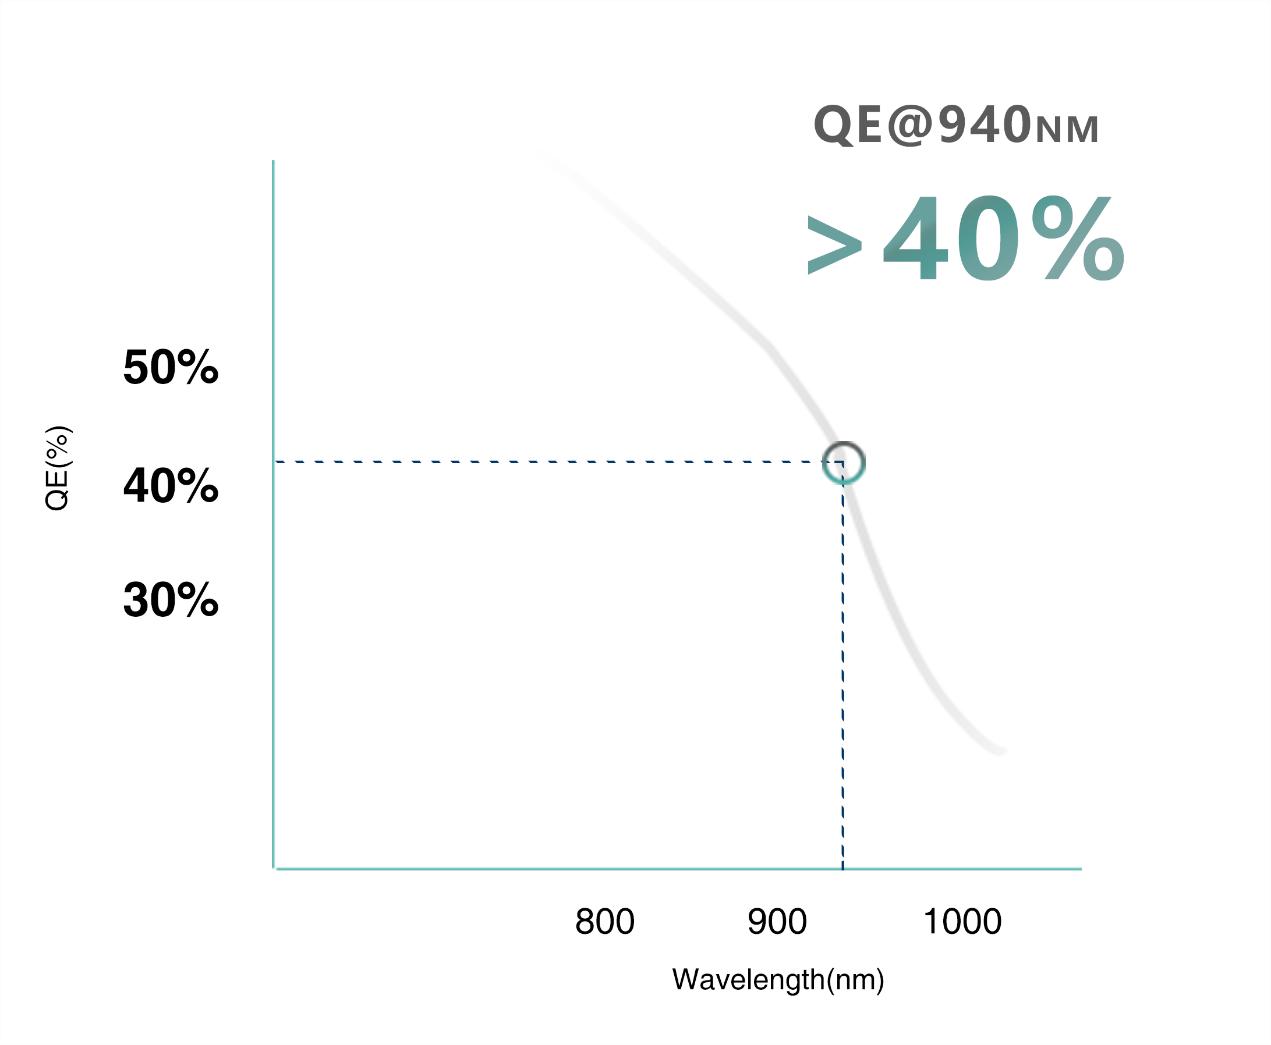 C:\Users\Ivy\Desktop\132GS-Fan_out 产品发布\QE曲线_静态.png